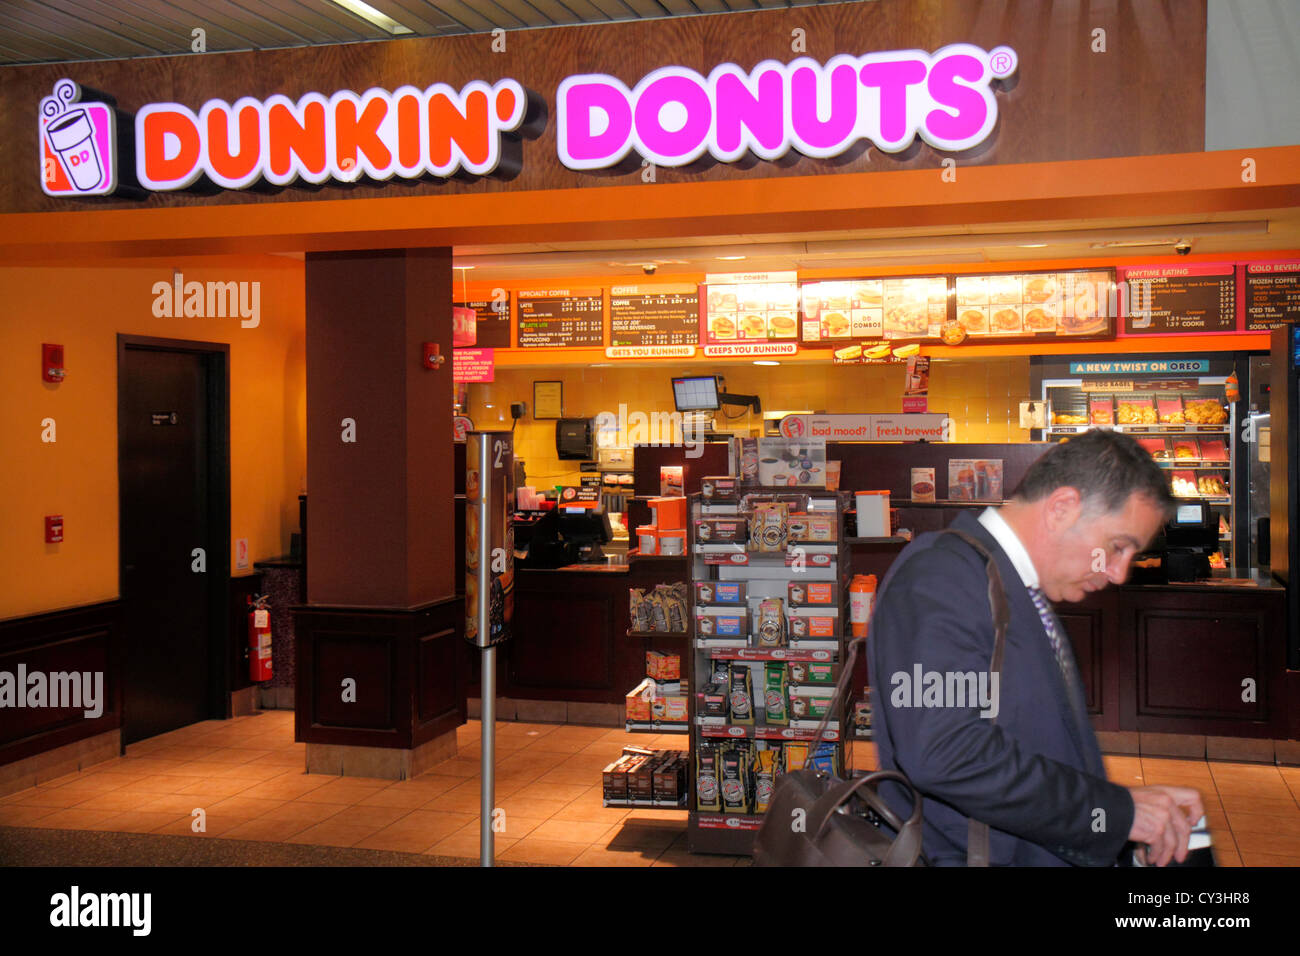 El Aeropuerto Internacional Logan de Boston Massachusetts BOS terminal concourse Dunkin' Donuts café snacks Imagen De Stock